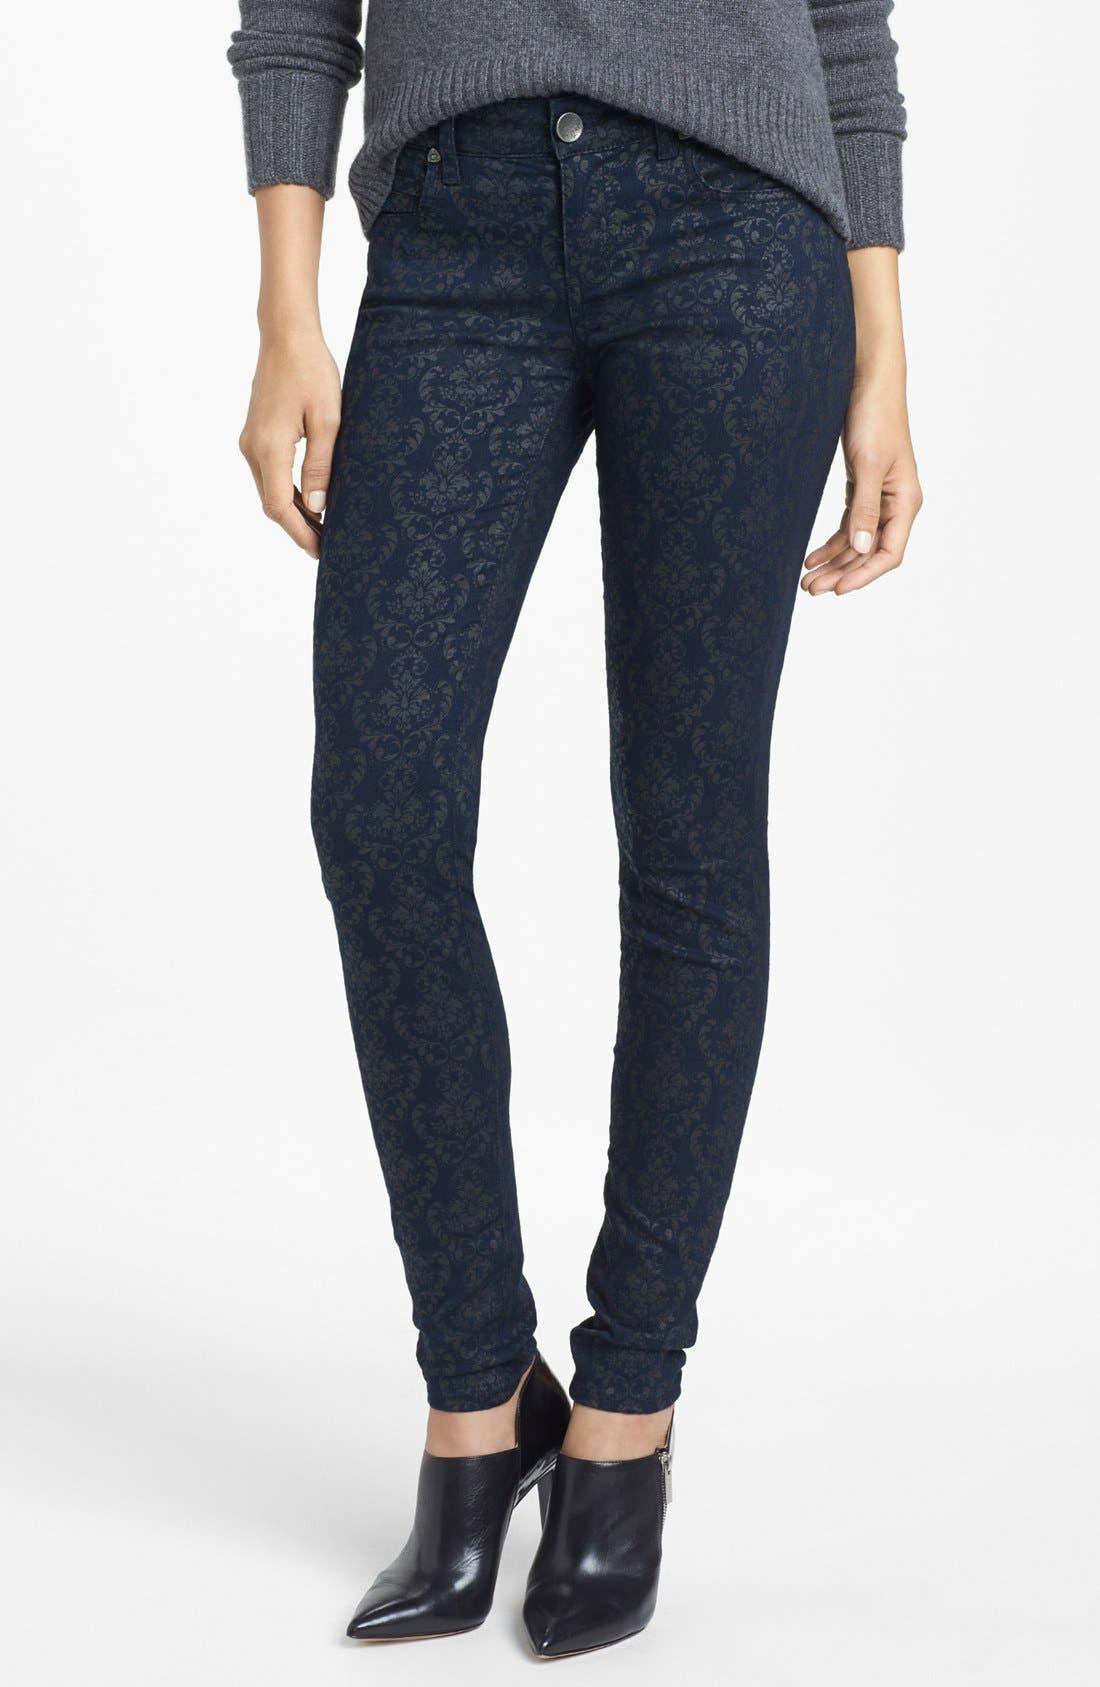 Main Image - KUT from the Kloth 'Mia' Print Skinny Jeans (Indigo)